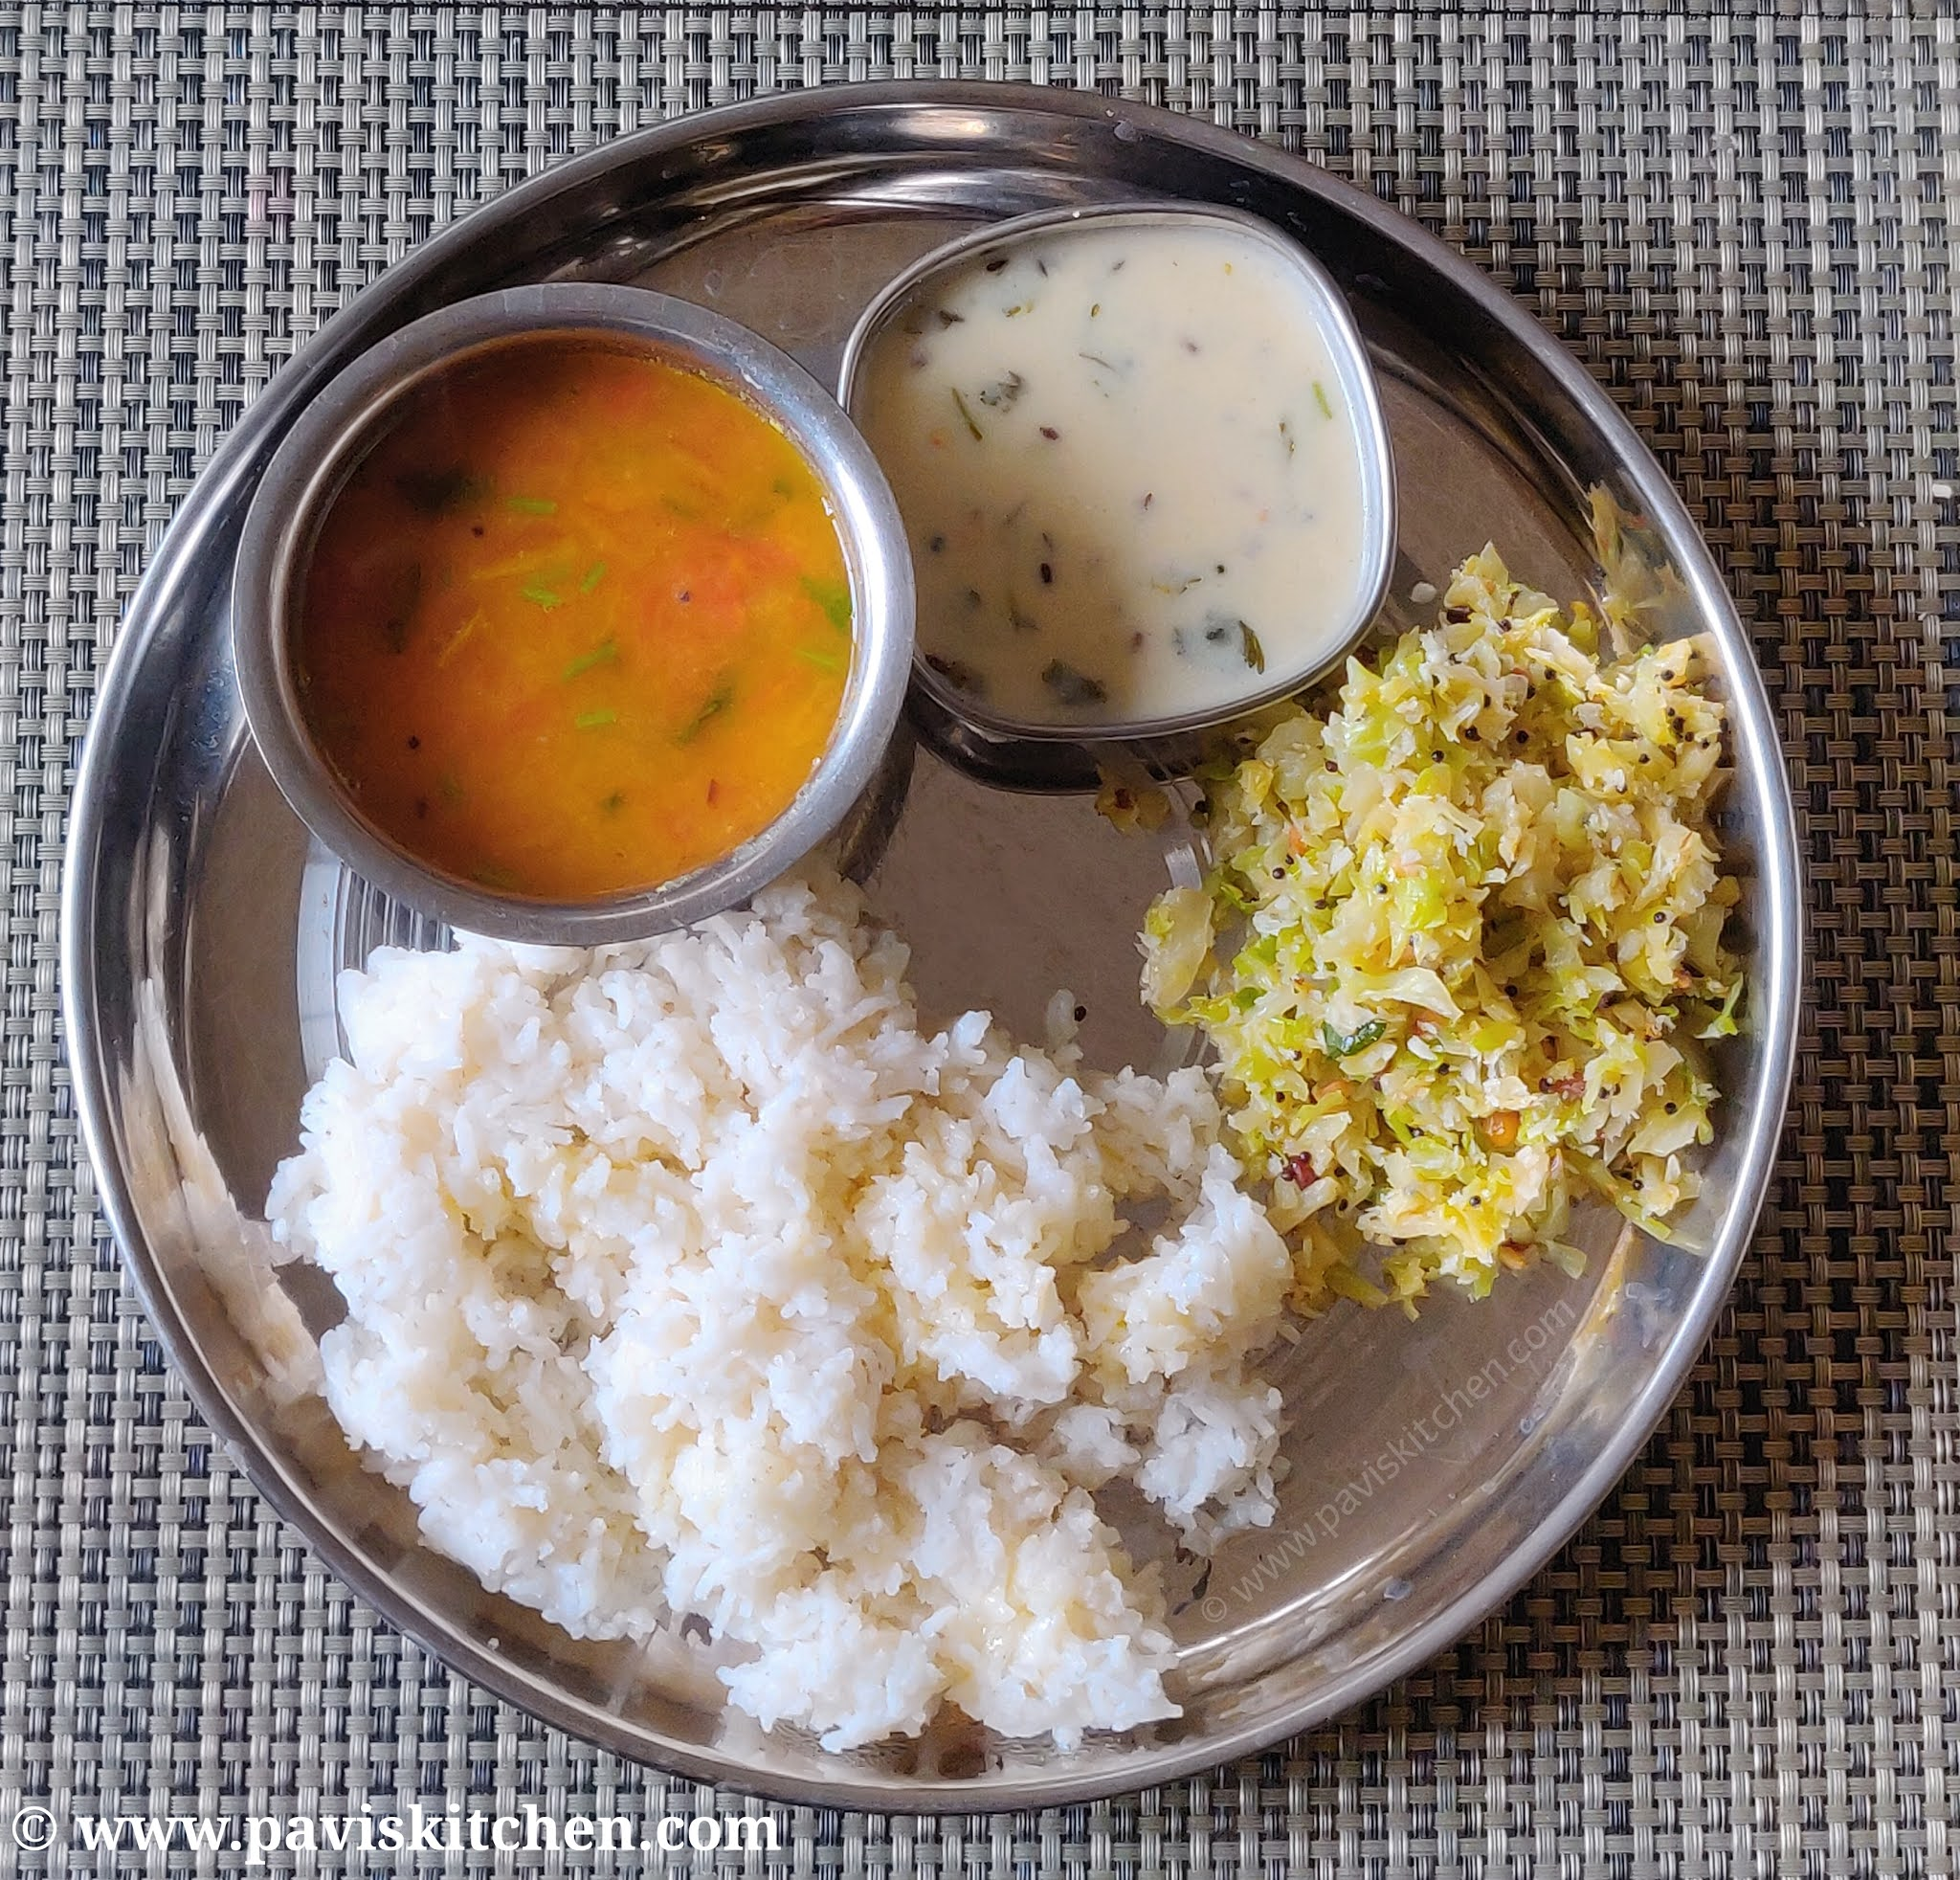 Satvik thali recipe | South Indian thali recipe | Sattvic food recipe ideas